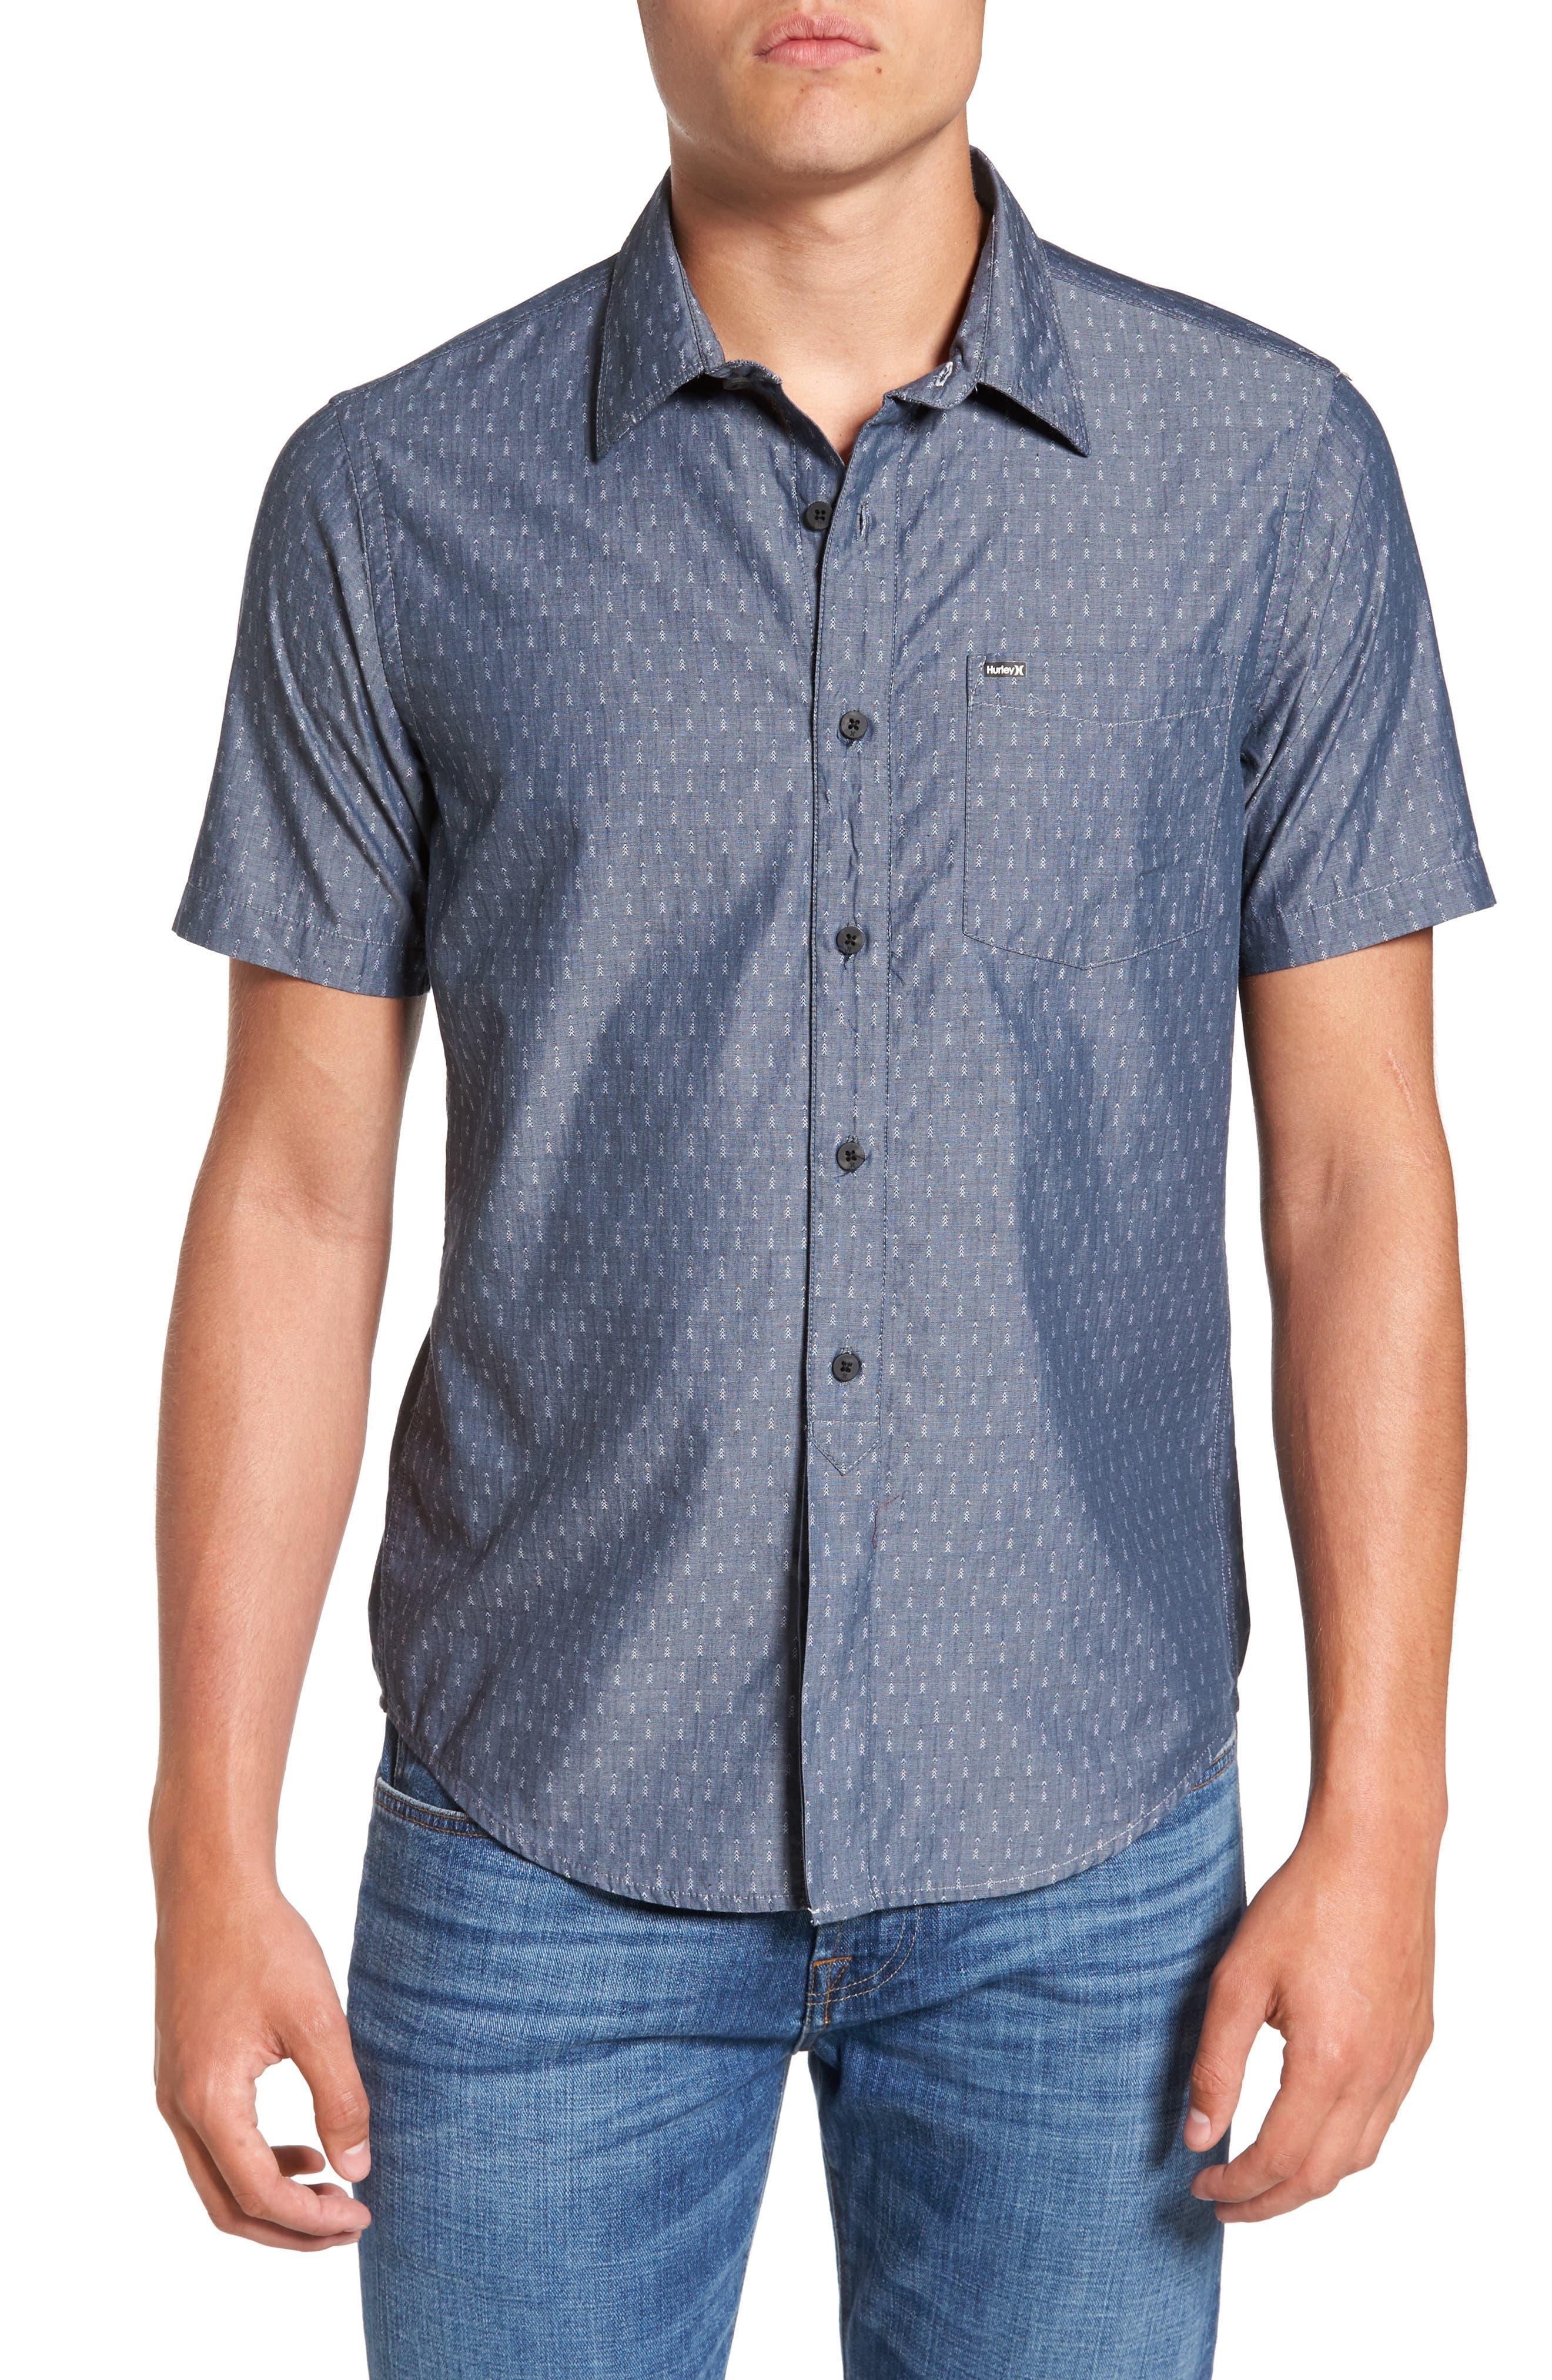 Hurley Lenny Woven Shirt